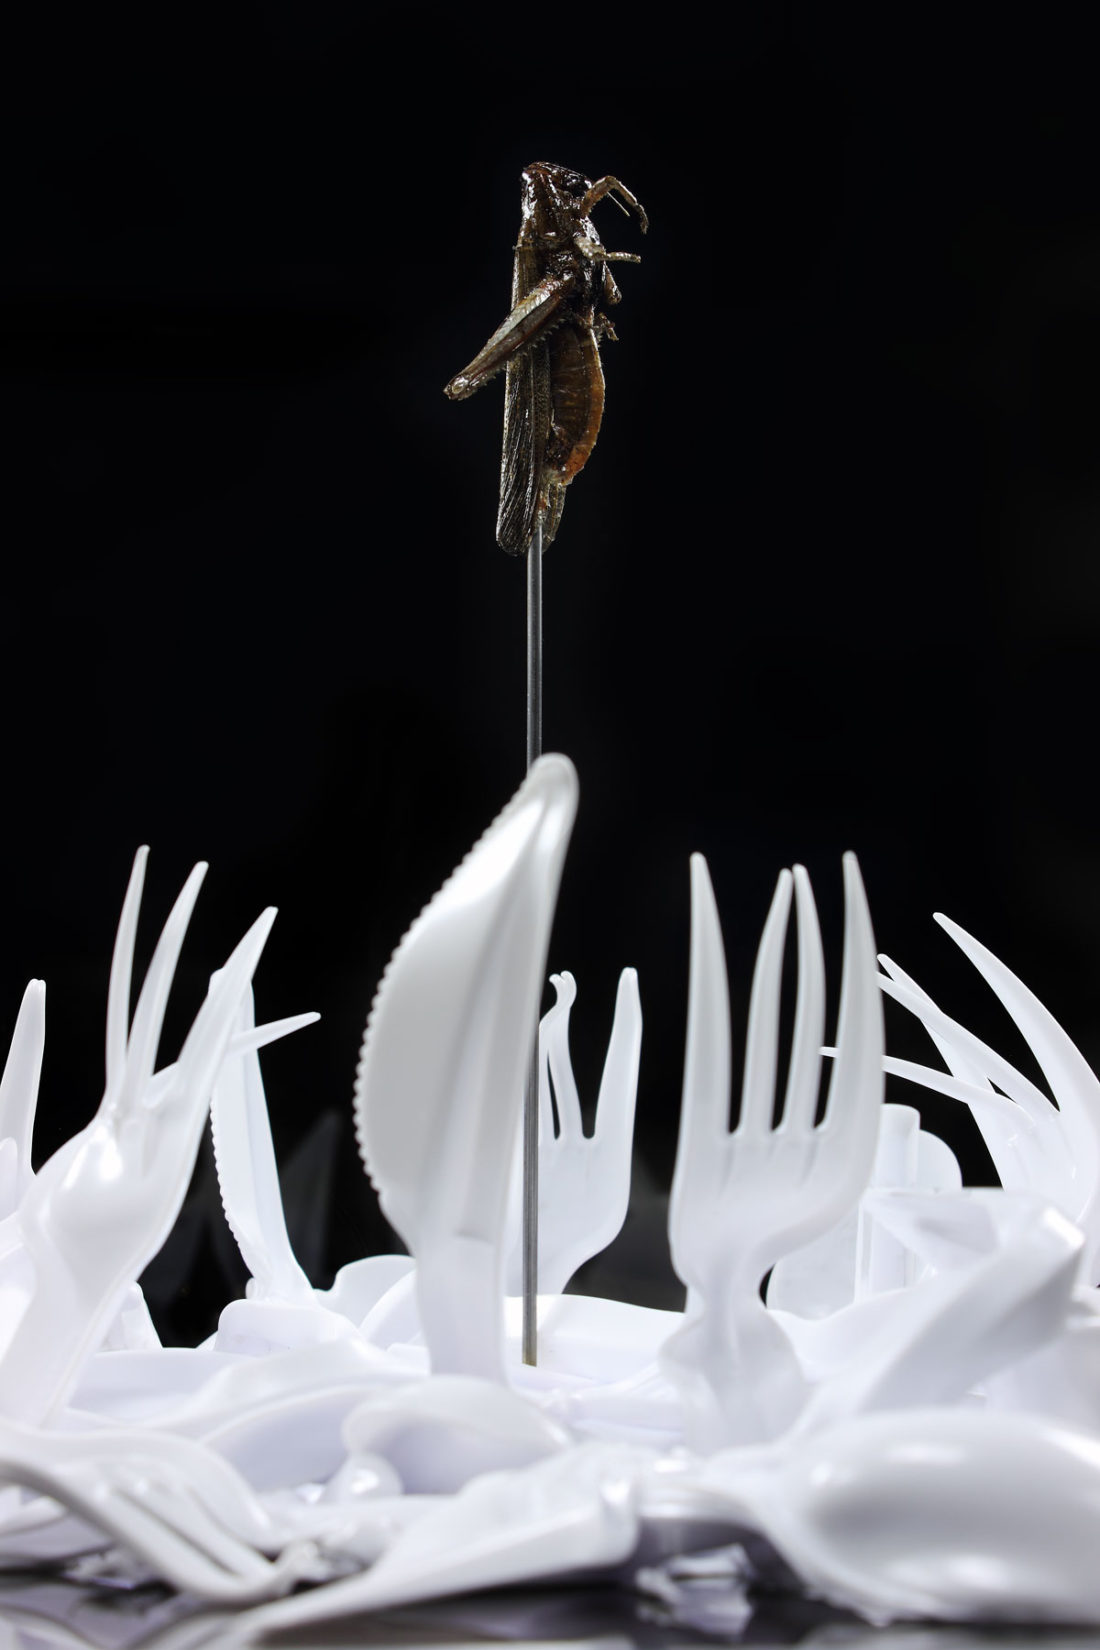 detail artwork locust - plastic cutlery created by meimorettini duo italian artists